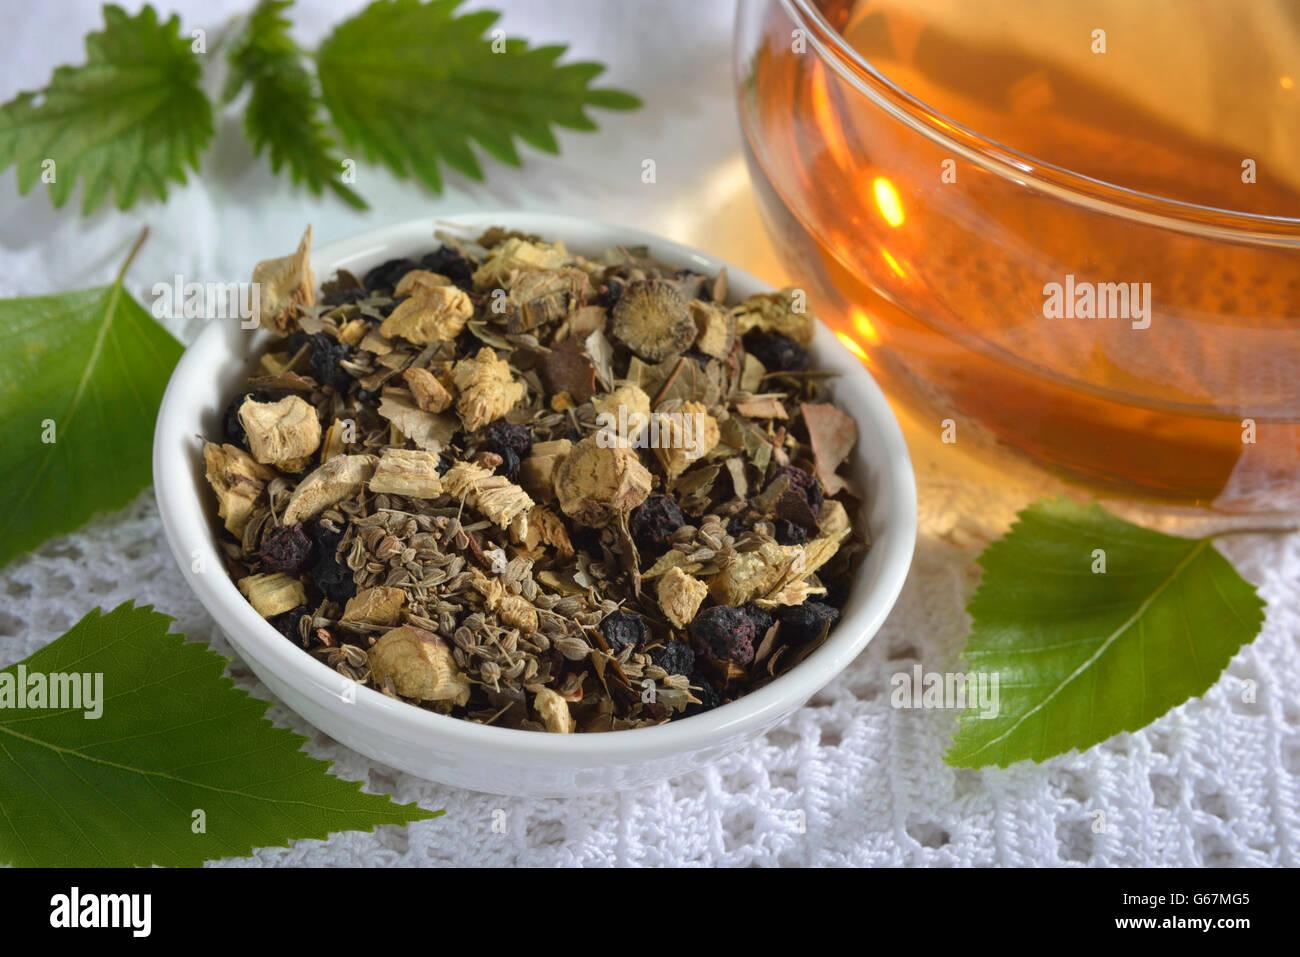 Liquorice root tea blend, birch leaves, stinging nettle, anise, blueberries / (Glycyrrhiza glabra, Betula pendula, - Stock Image